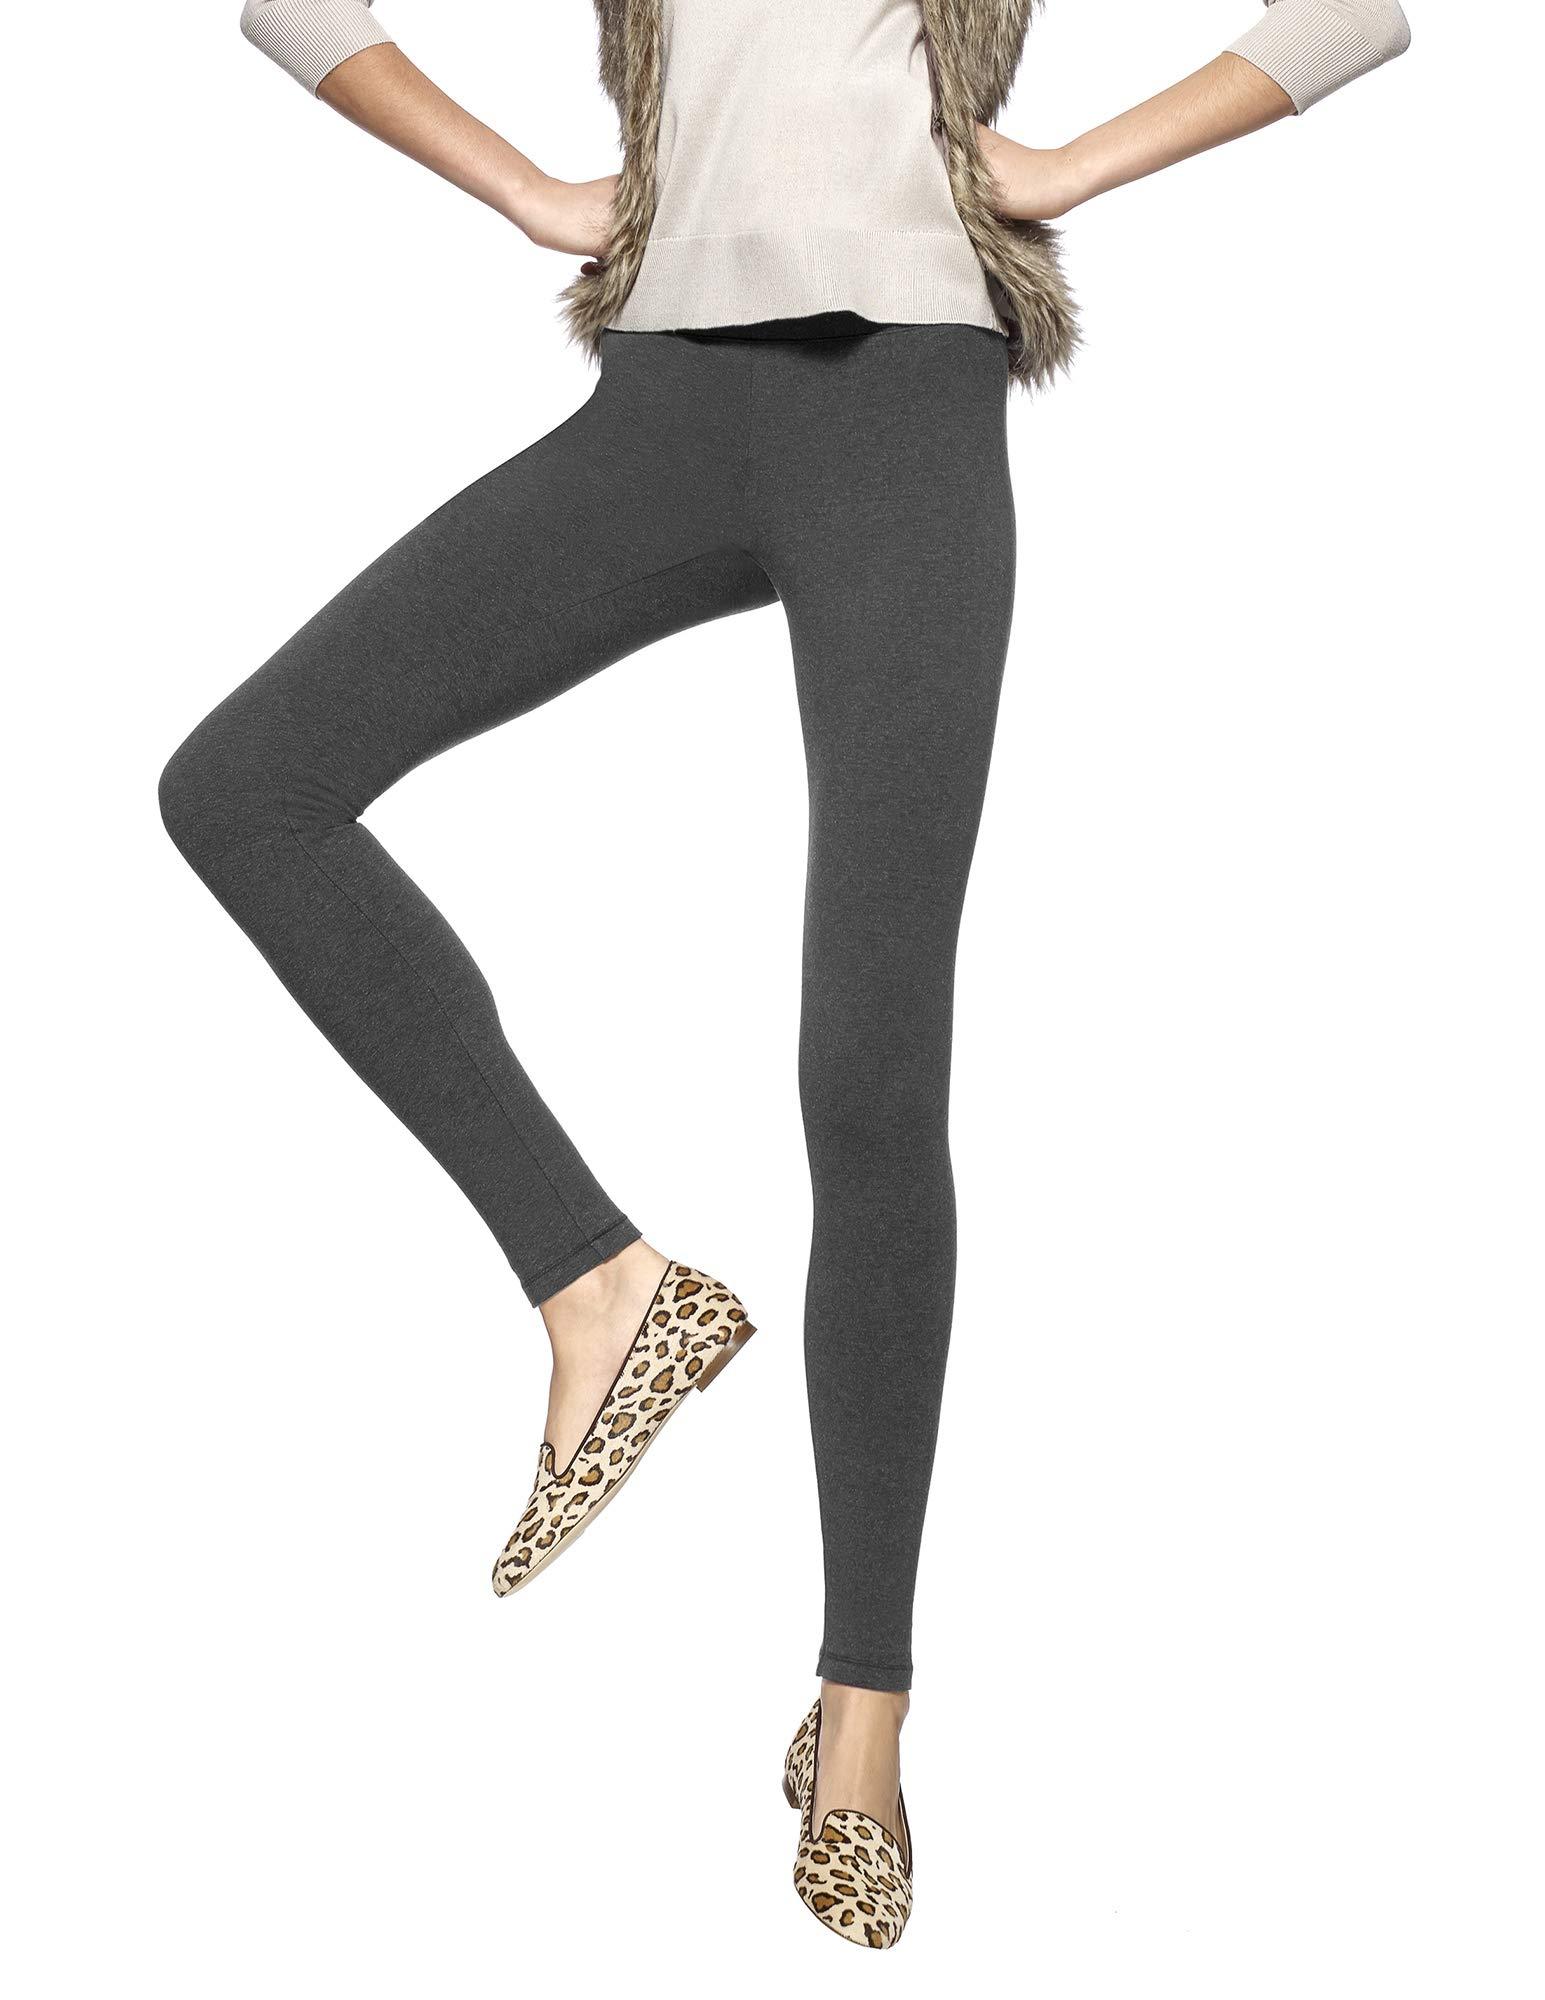 Hue Women's Ultra Legging with Wide Waistband - Medium - Graphite Heather